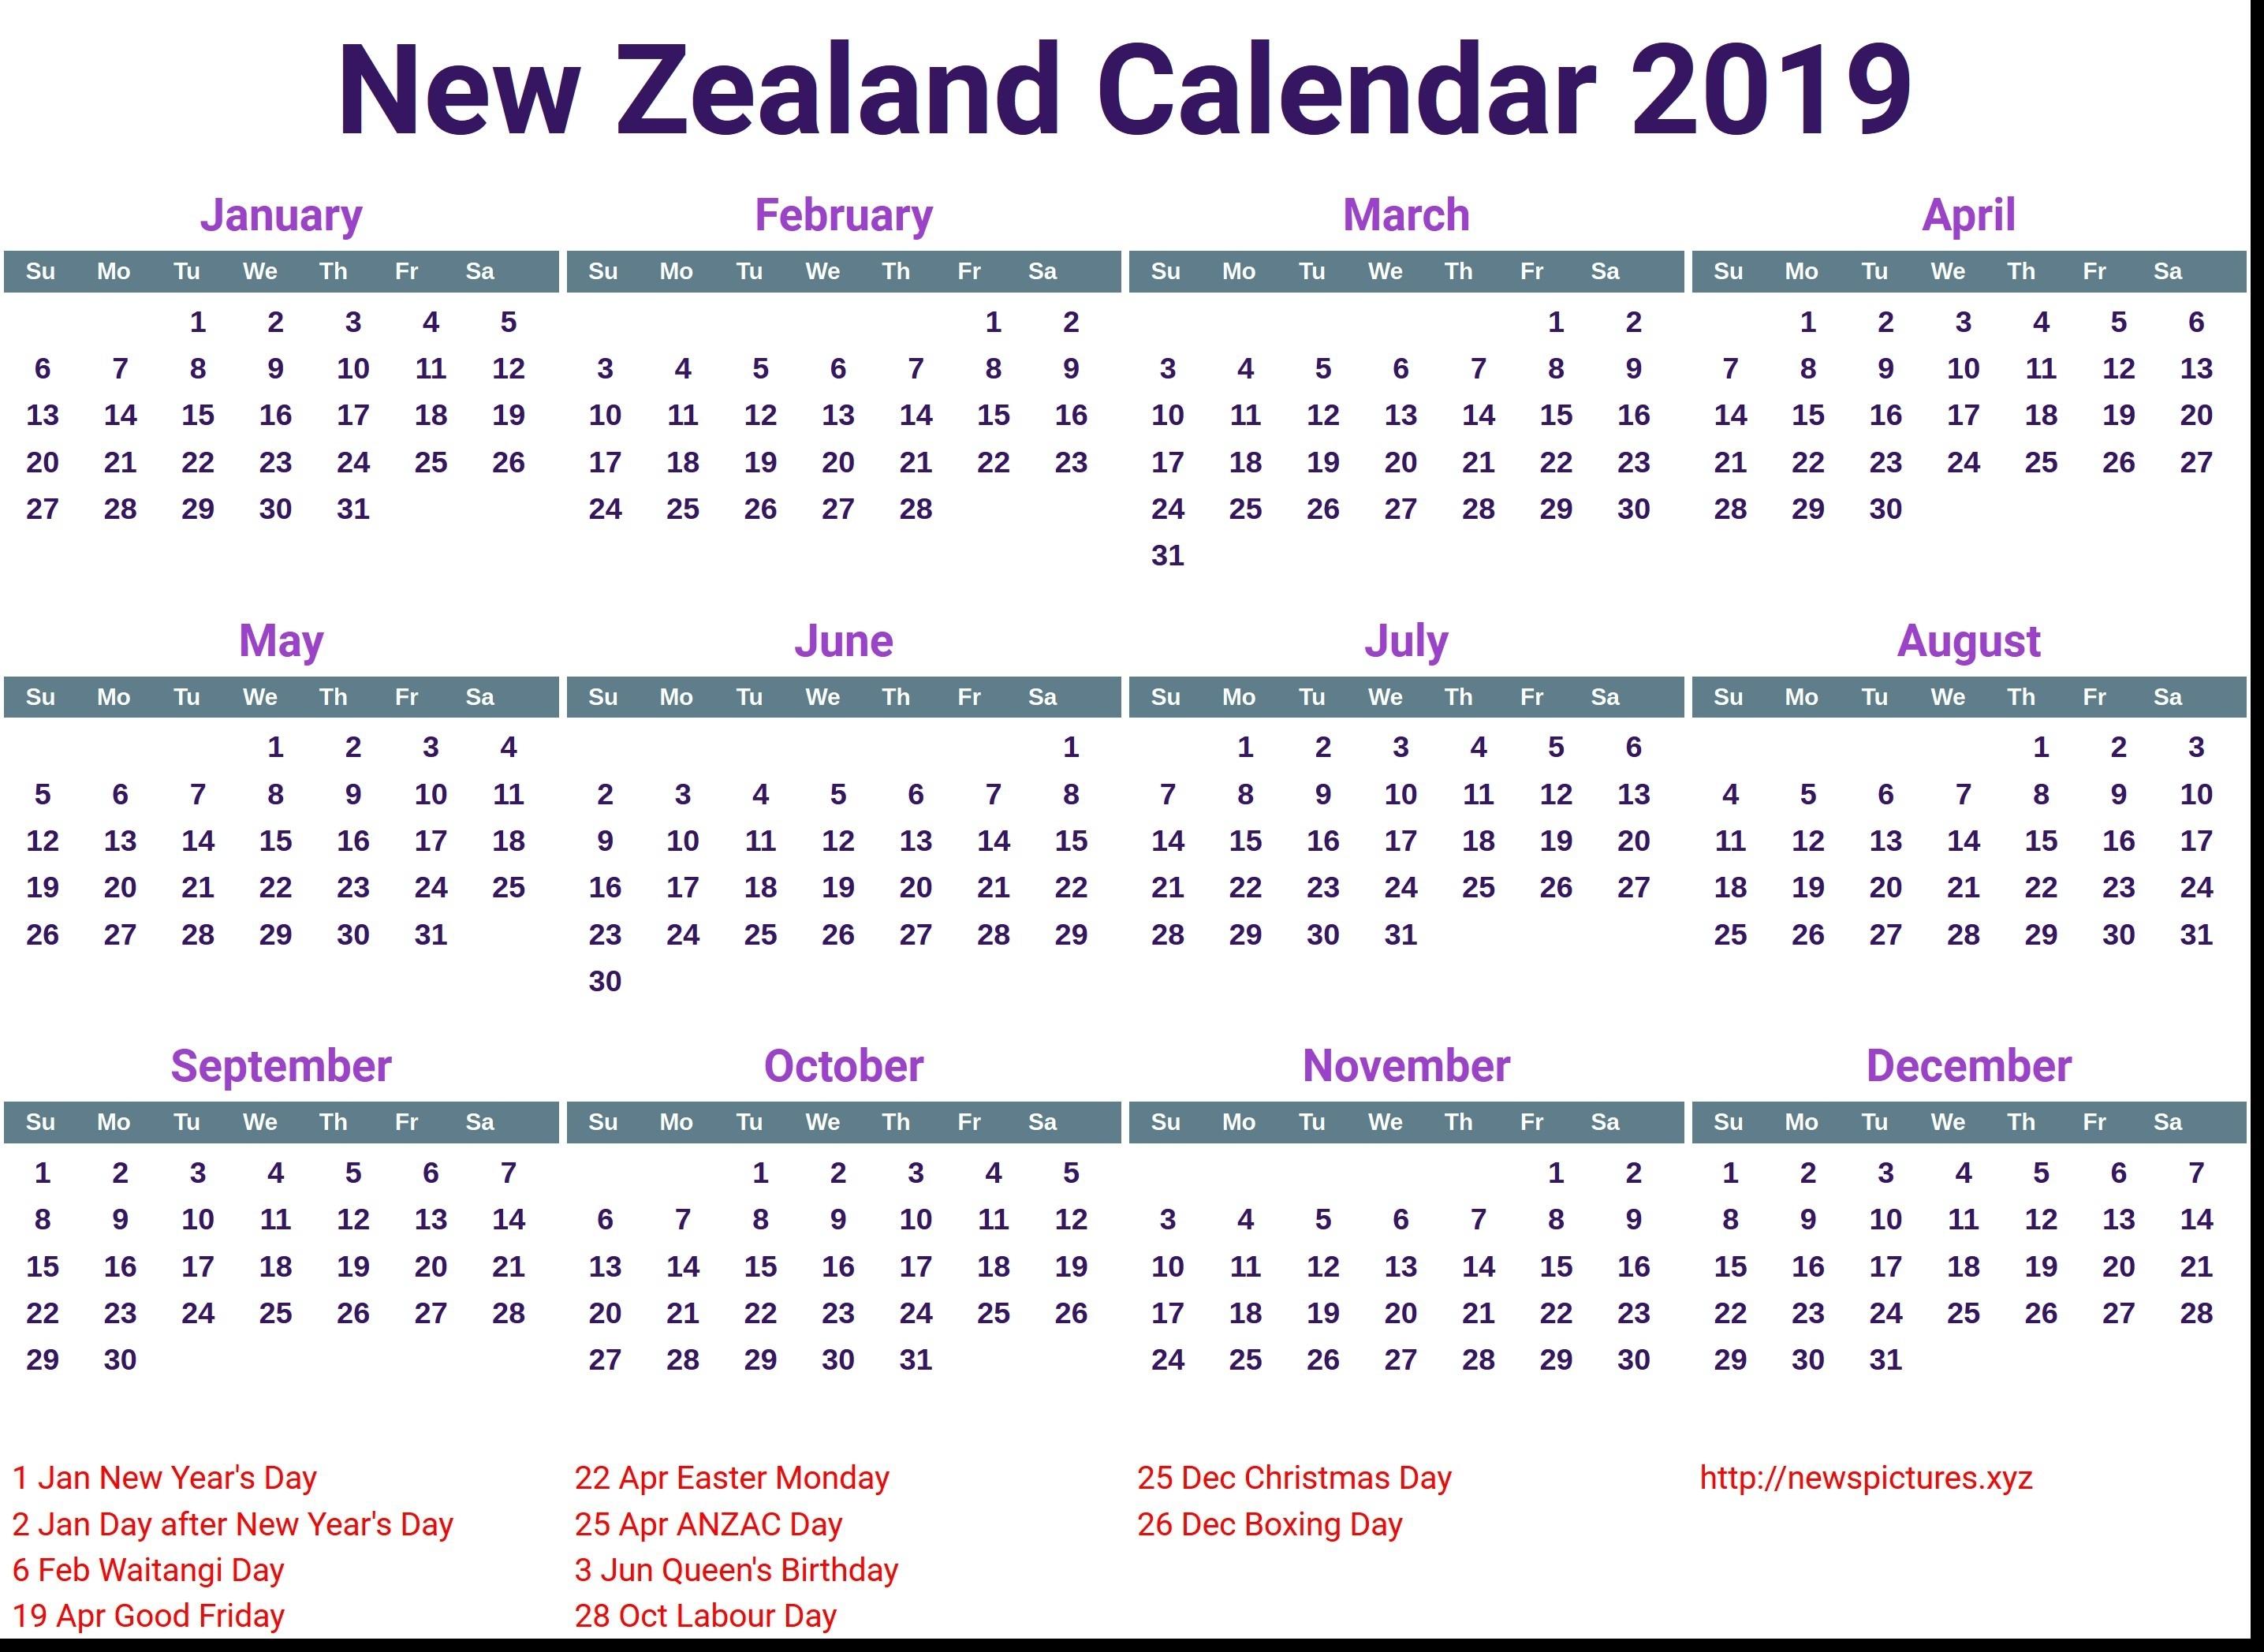 Calendar Nz Holidays 2019 • Printable Blank Calendar Template Apple Calendar Nz Holidays